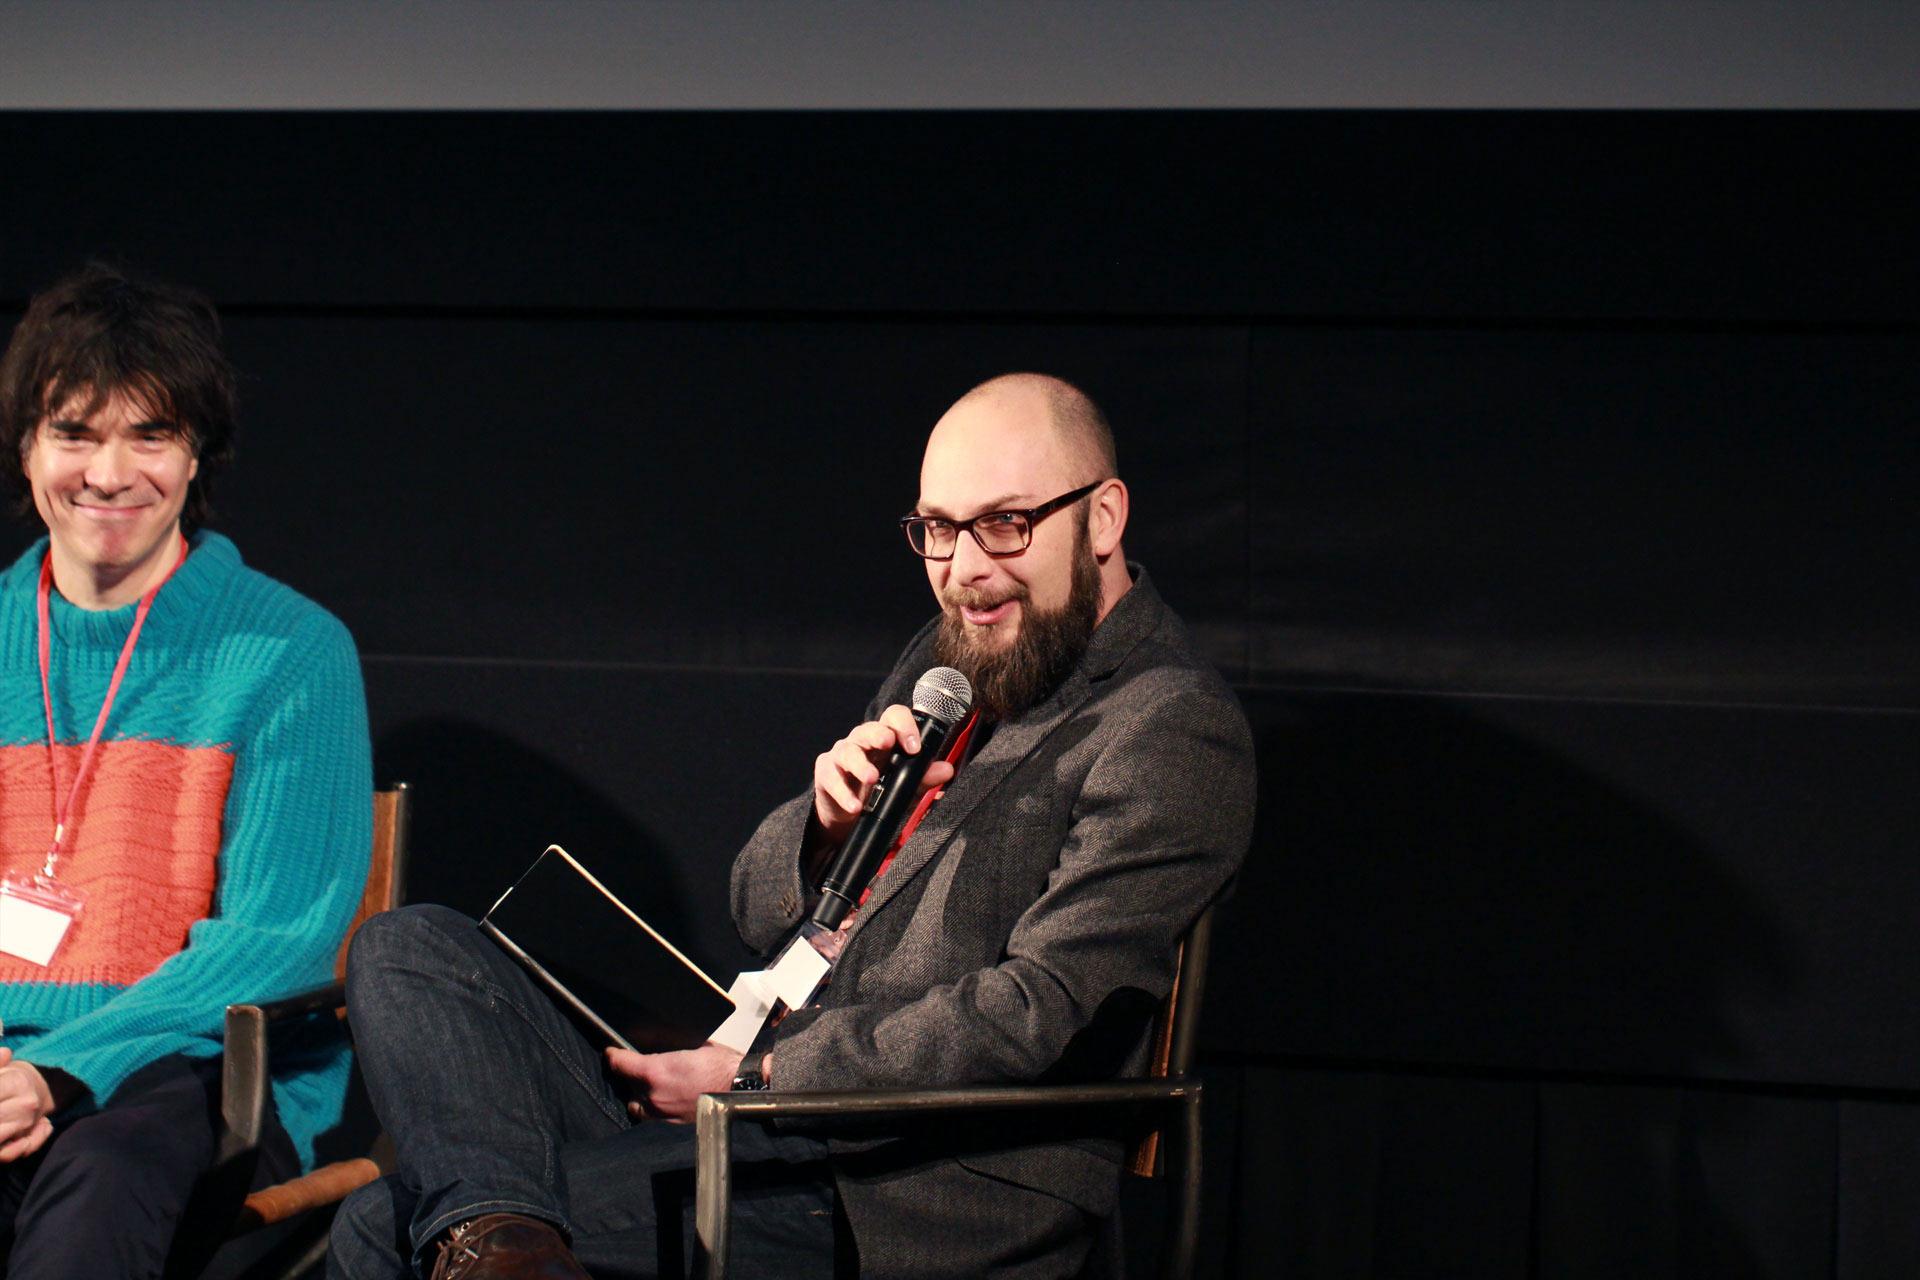 2020 EditCon Panel 2 no script no problem on stage at TIFF